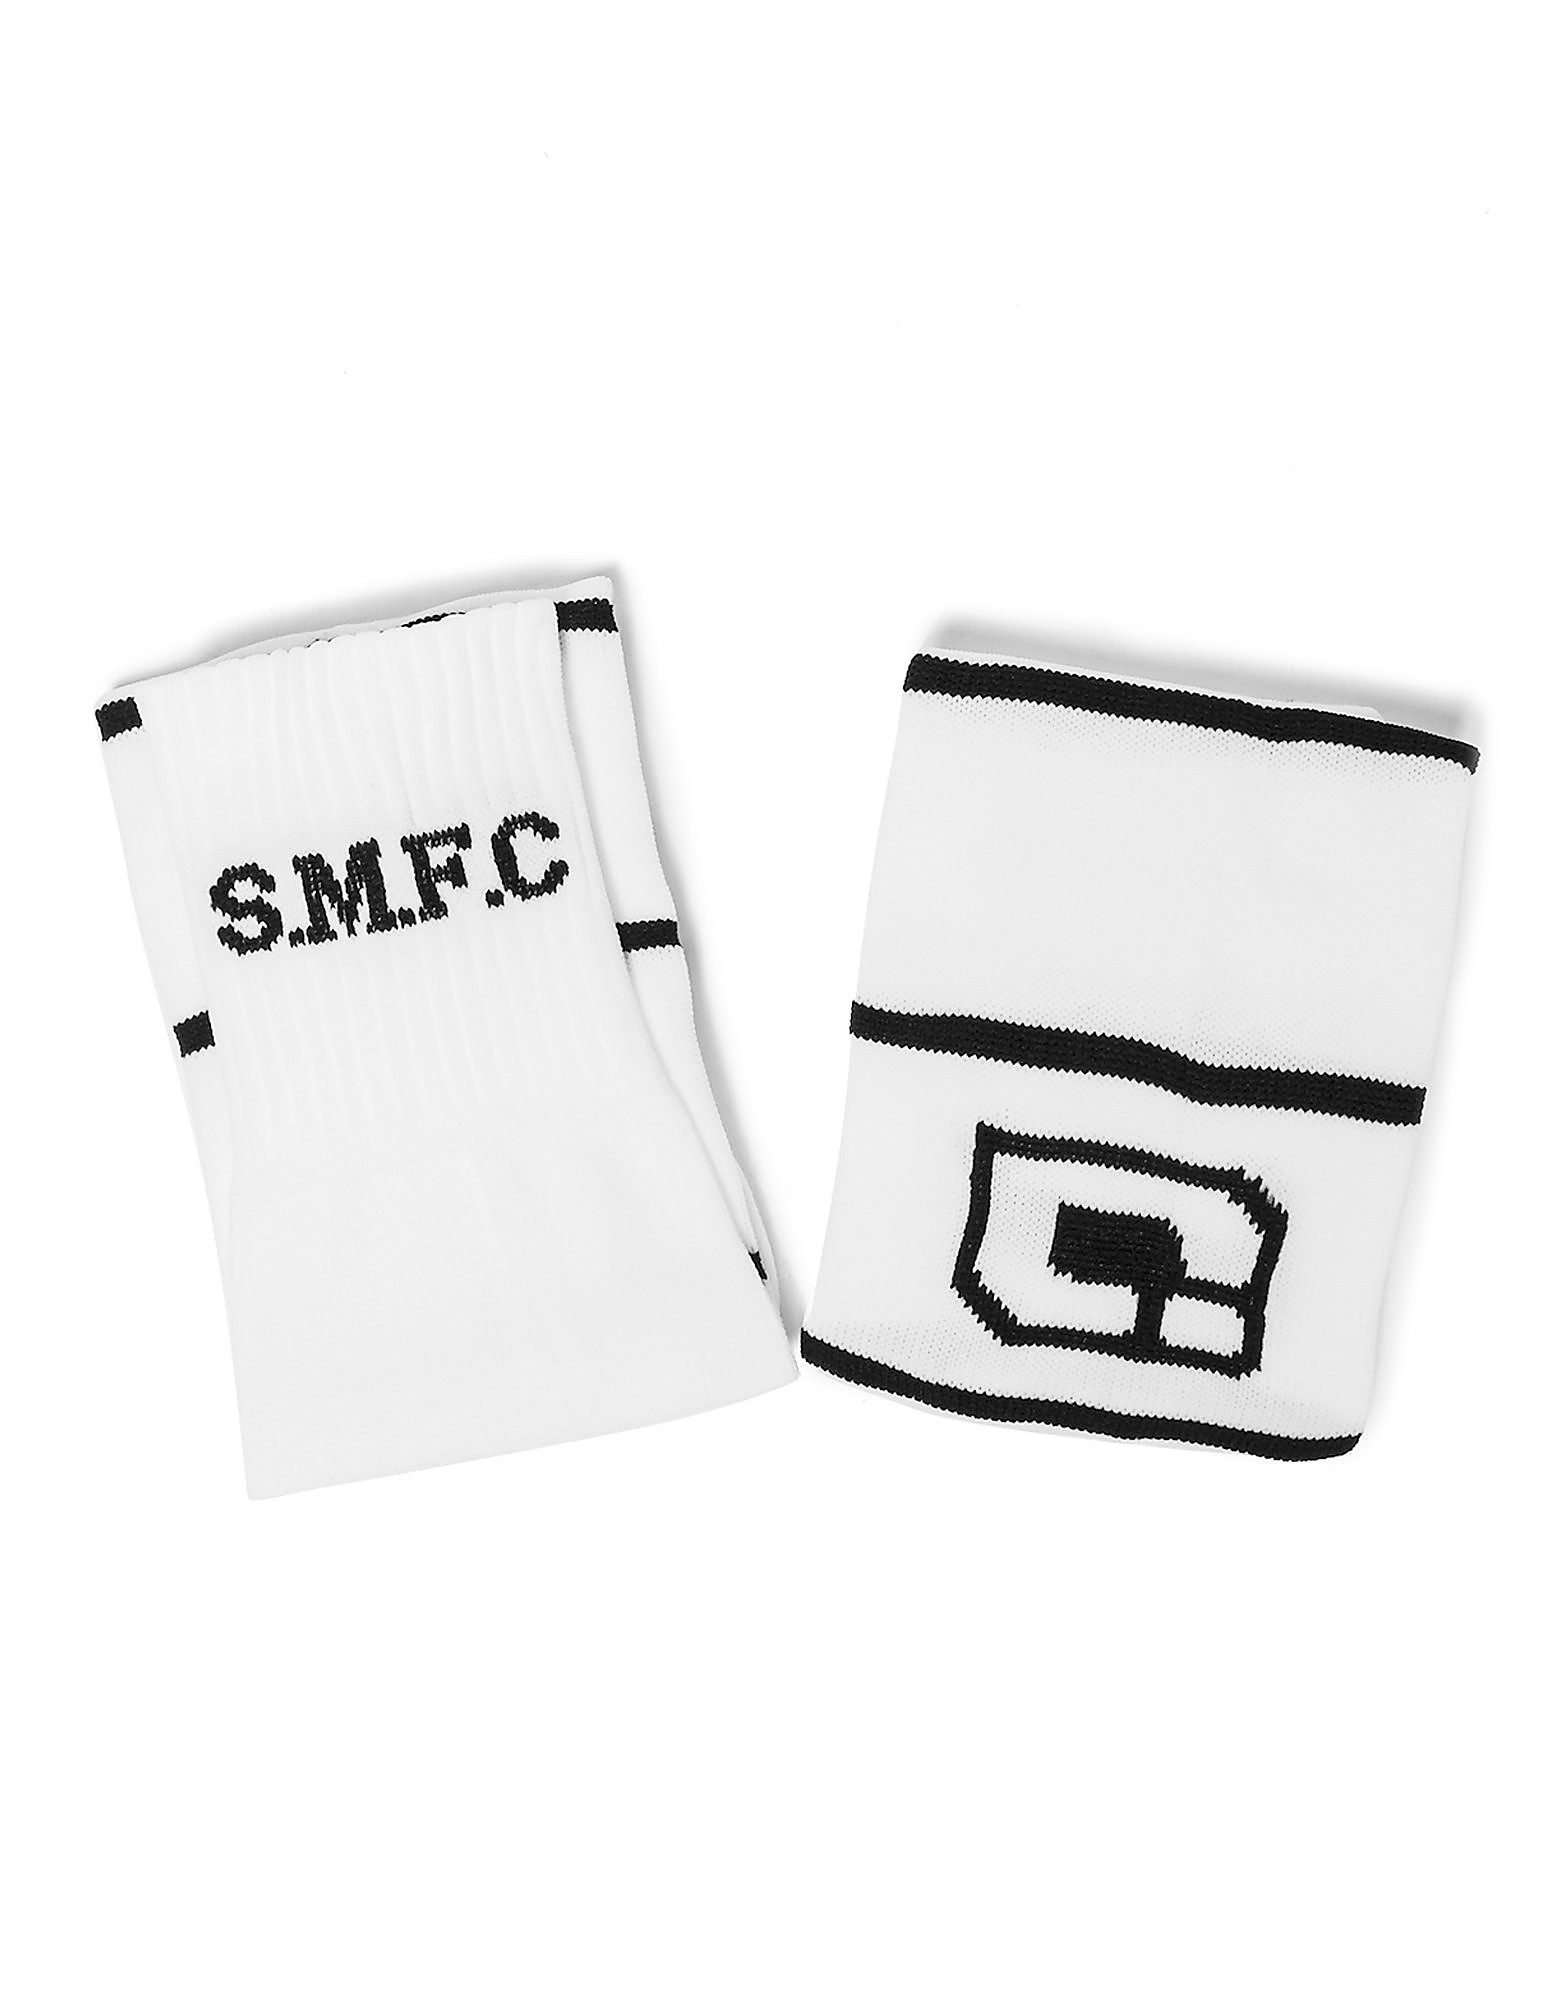 Carbrini St Mirren FC 2016/17 Home Socks PRE ORDER